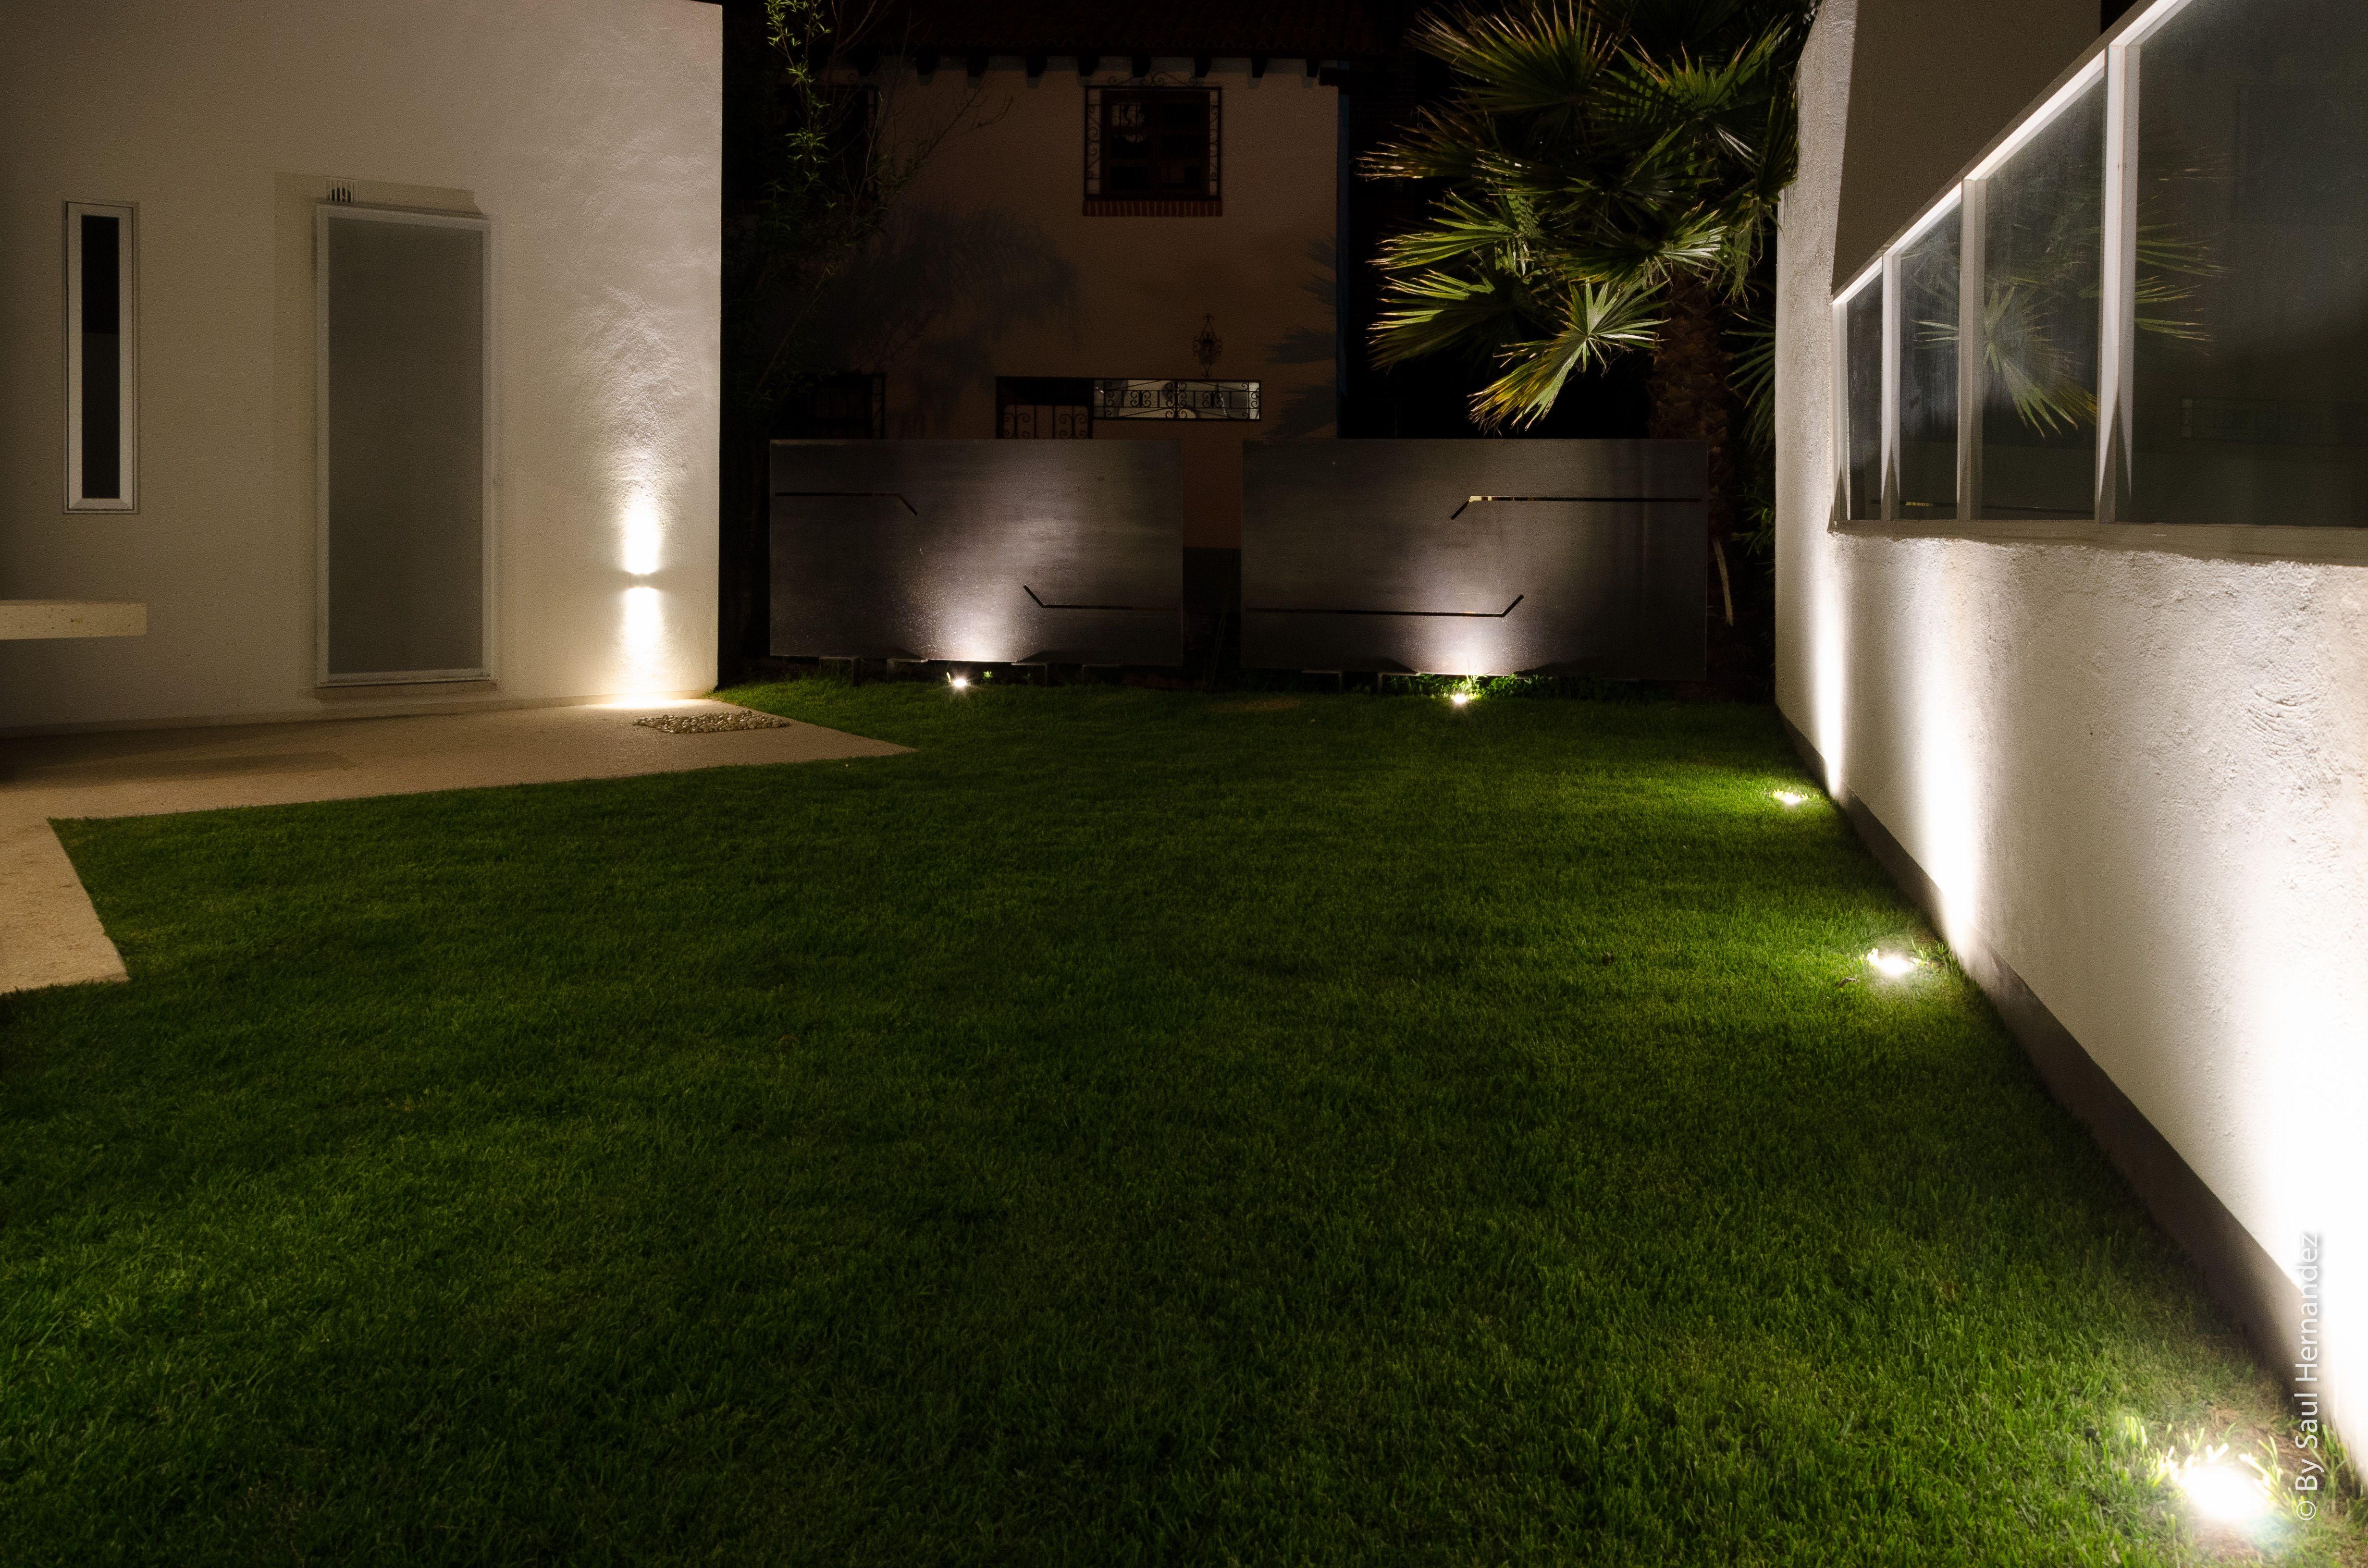 Iluminacion jardin iluminacin de jardines ideas para - Iluminacion led exterior jardin ...